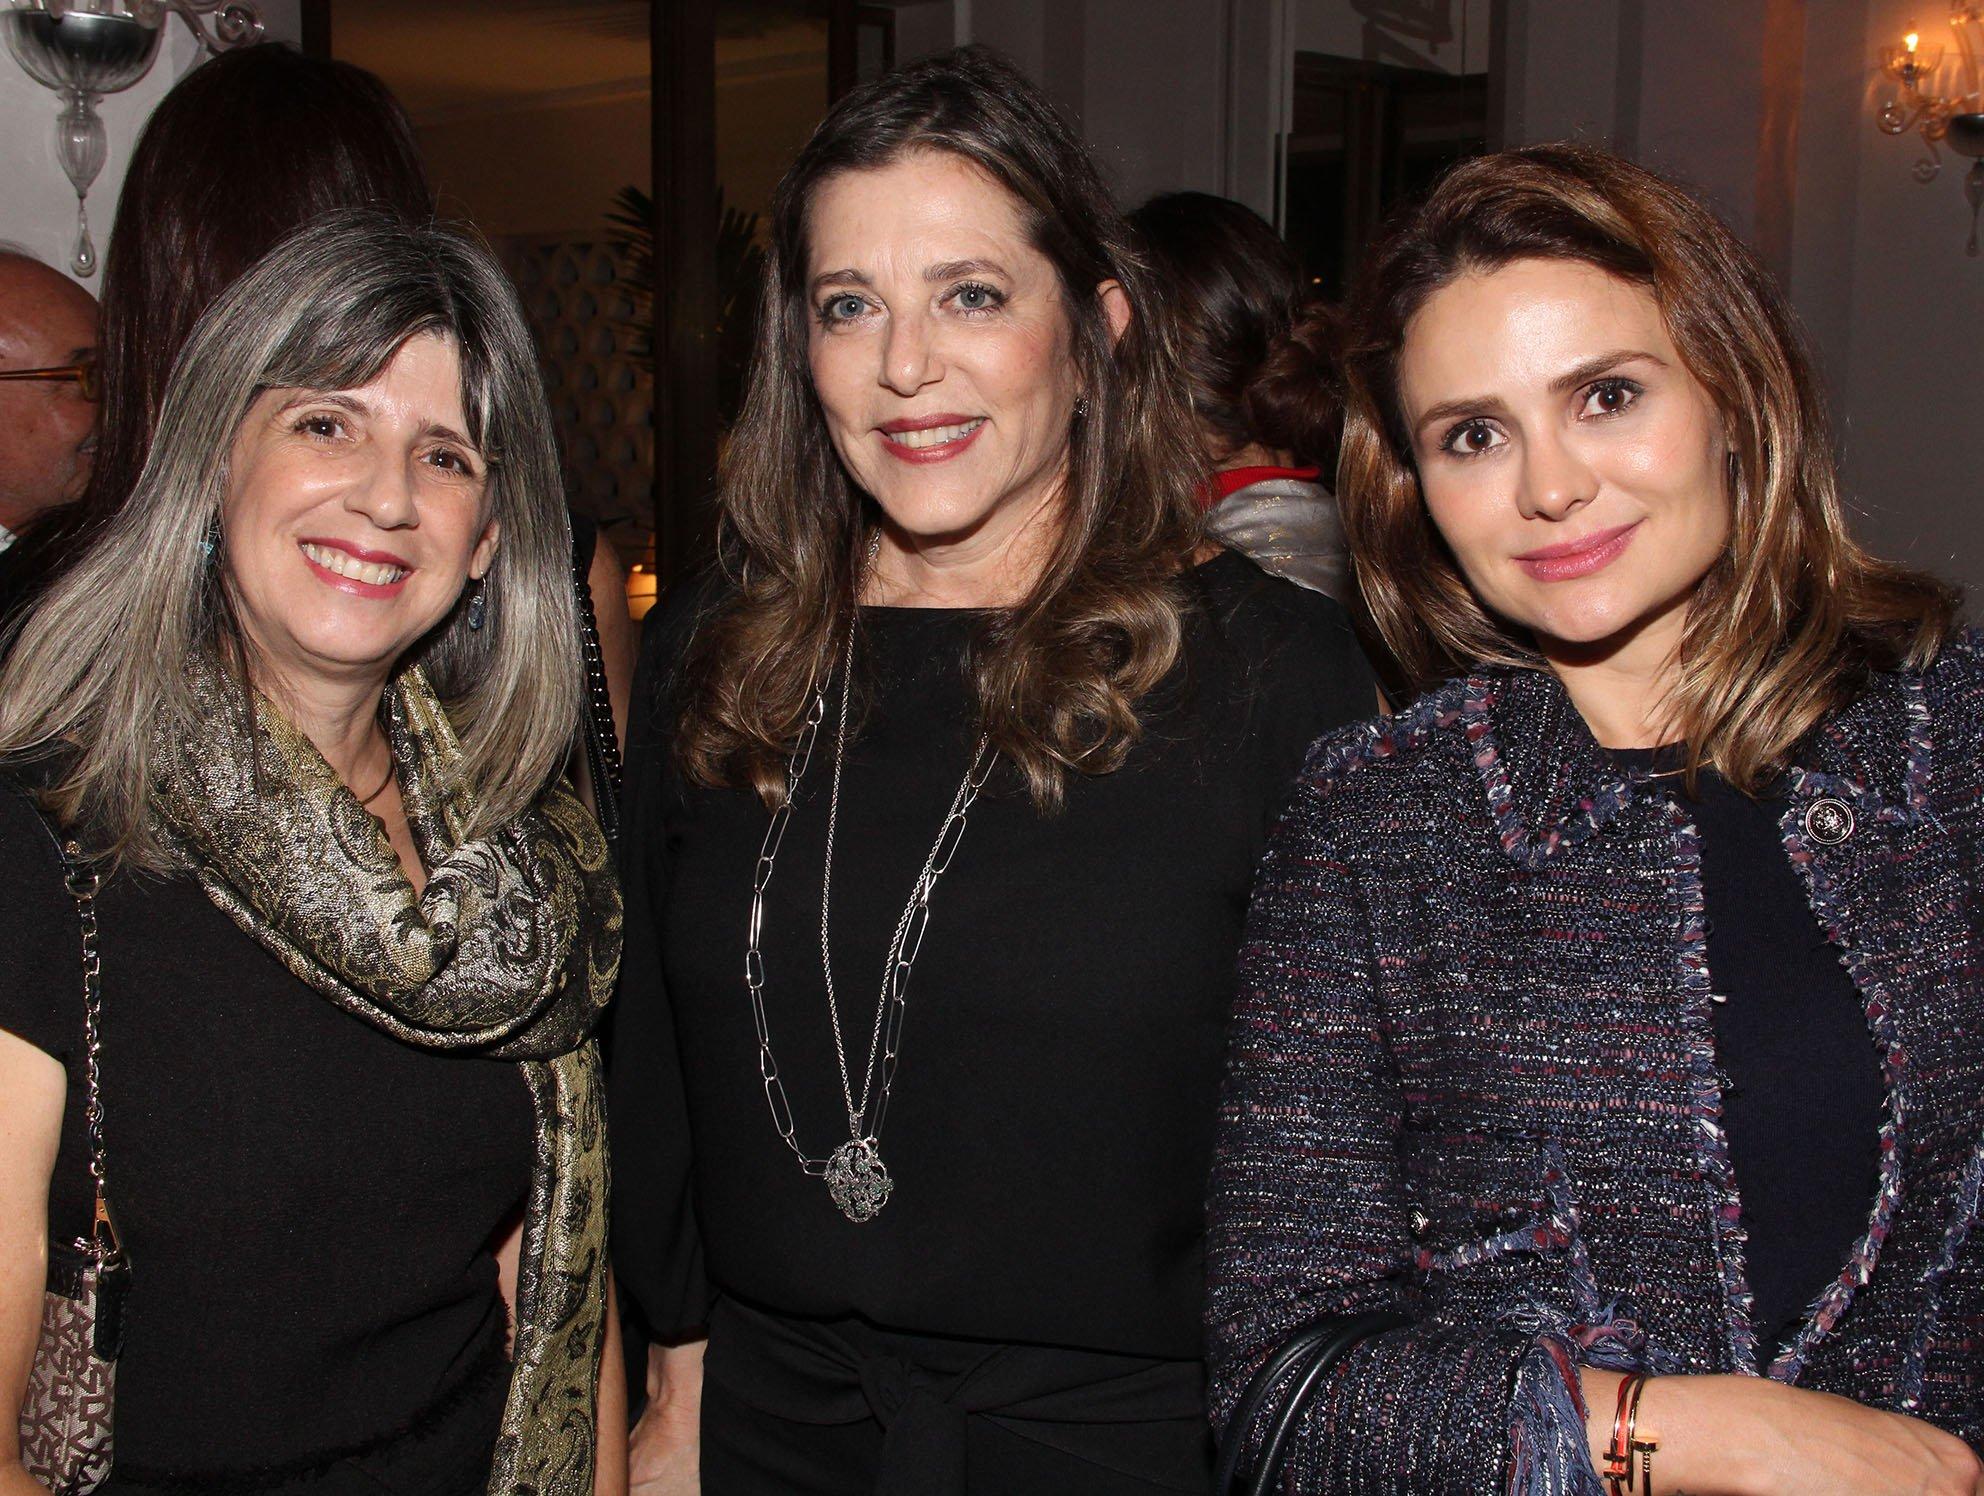 Silvana Freitas, Andréia Repsold e Renta Villarta  /Foto: Paulo de Deus